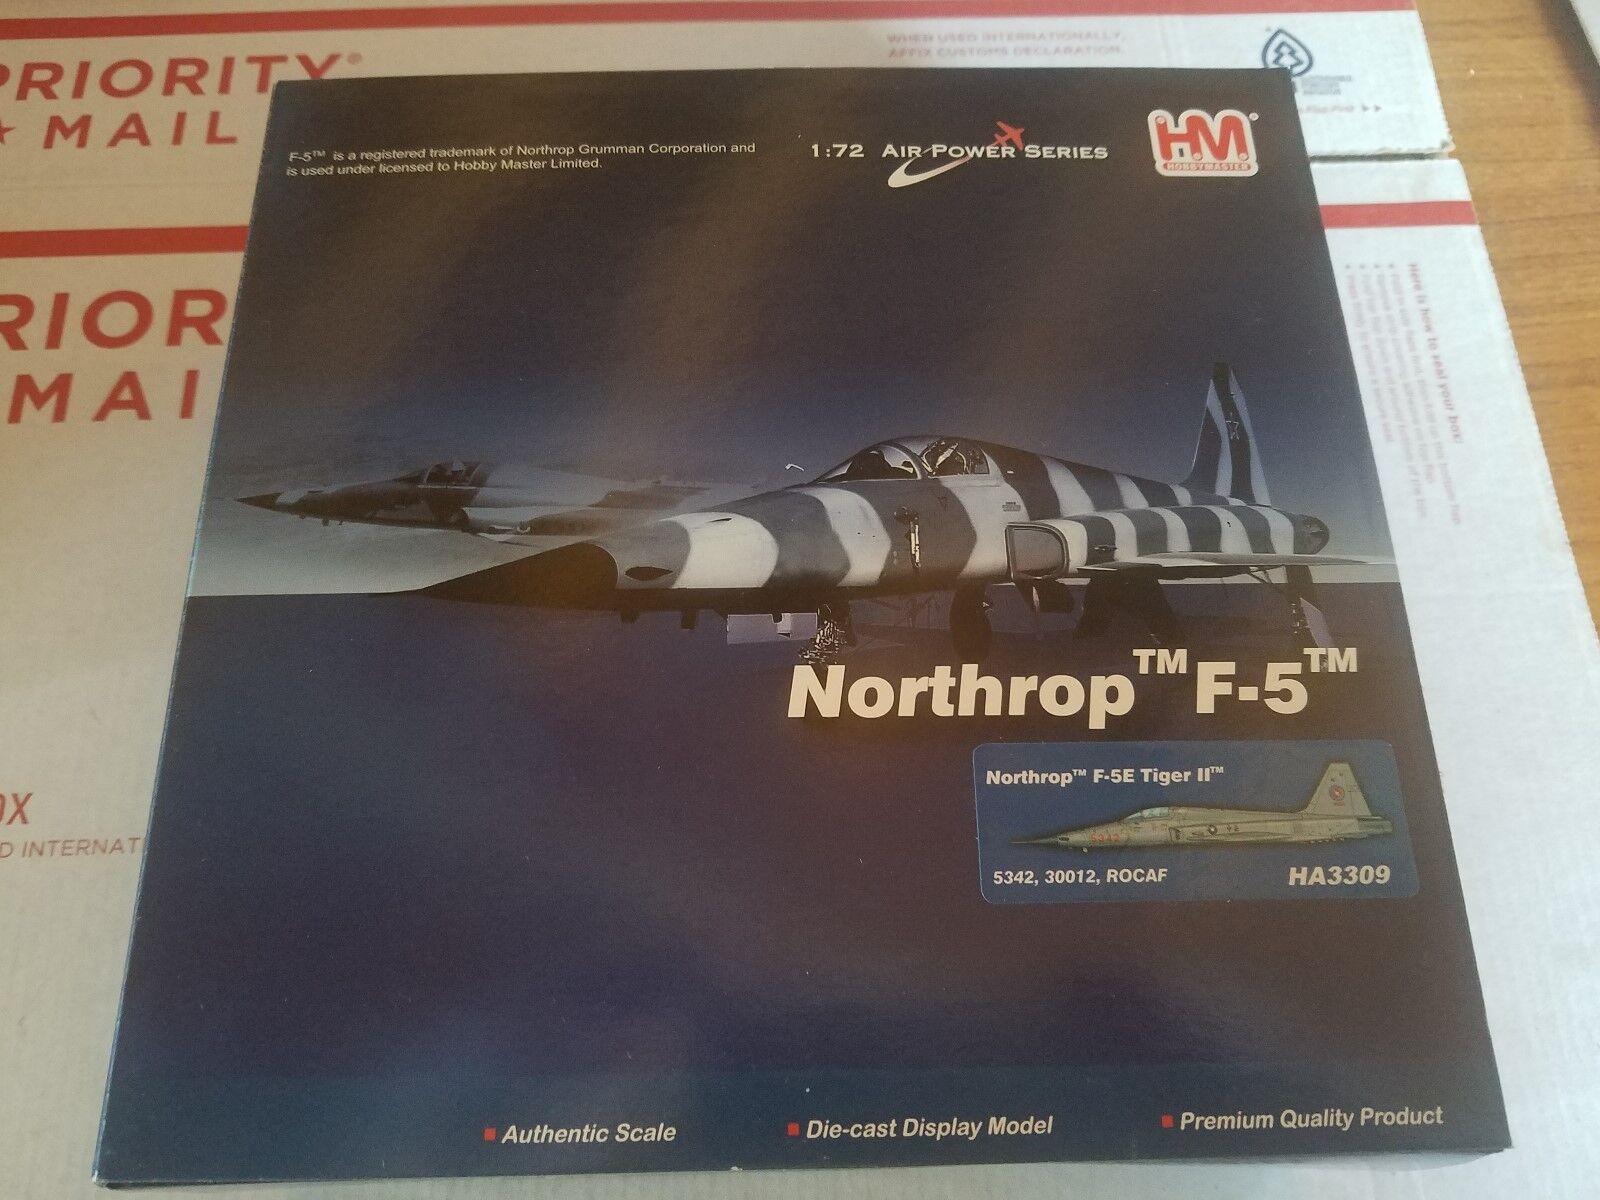 Hobby Master 1 72 aire potencia serie HA3309 Northrop F-5E Tiger II 5342, 30112,